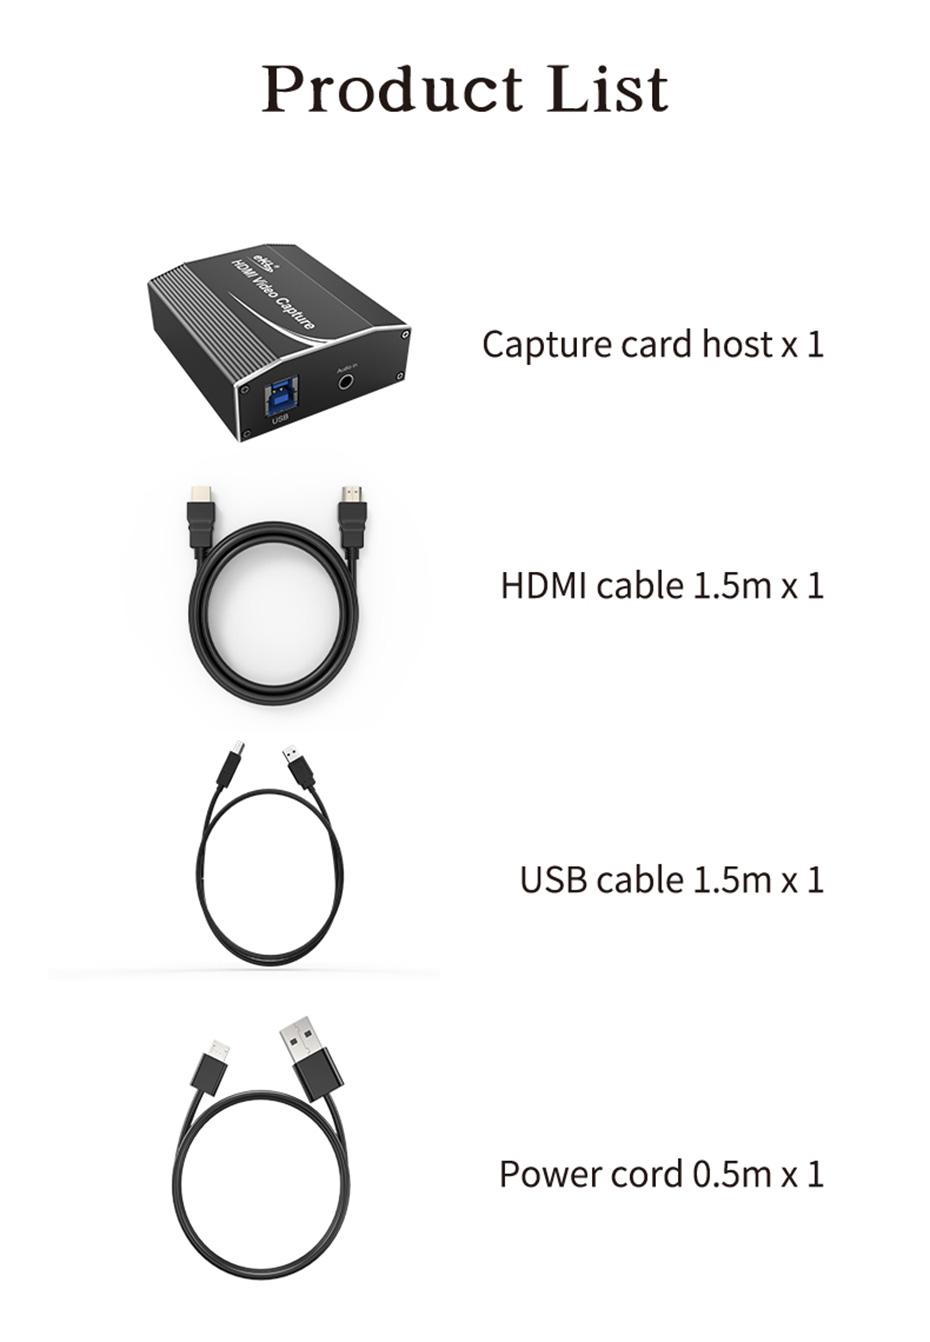 HDMI video live capture card 1805 standard accessories